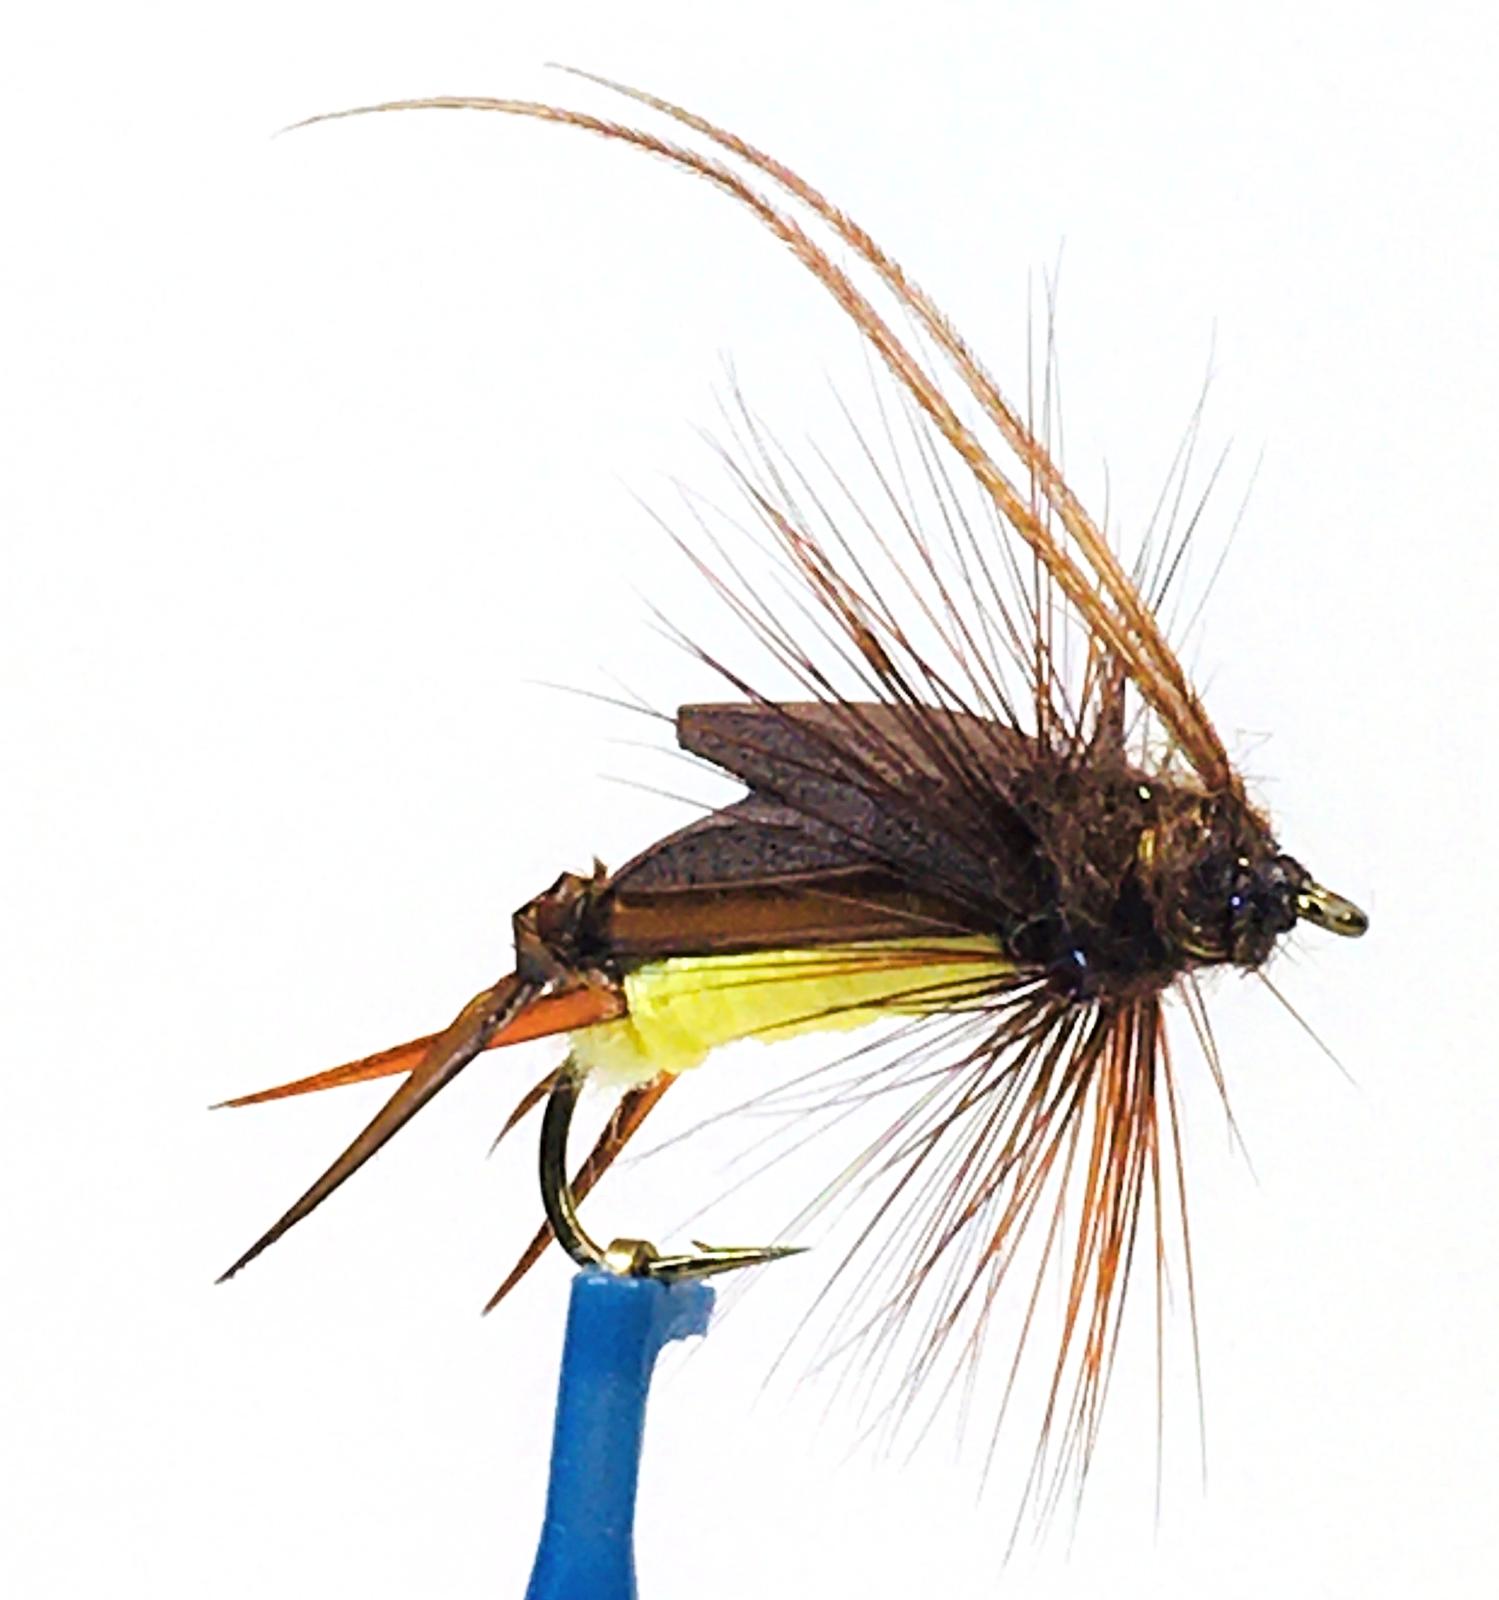 Size 6 Made in USA Crayfish 3 pk Weighted Crawfish Fly Pattern Orange